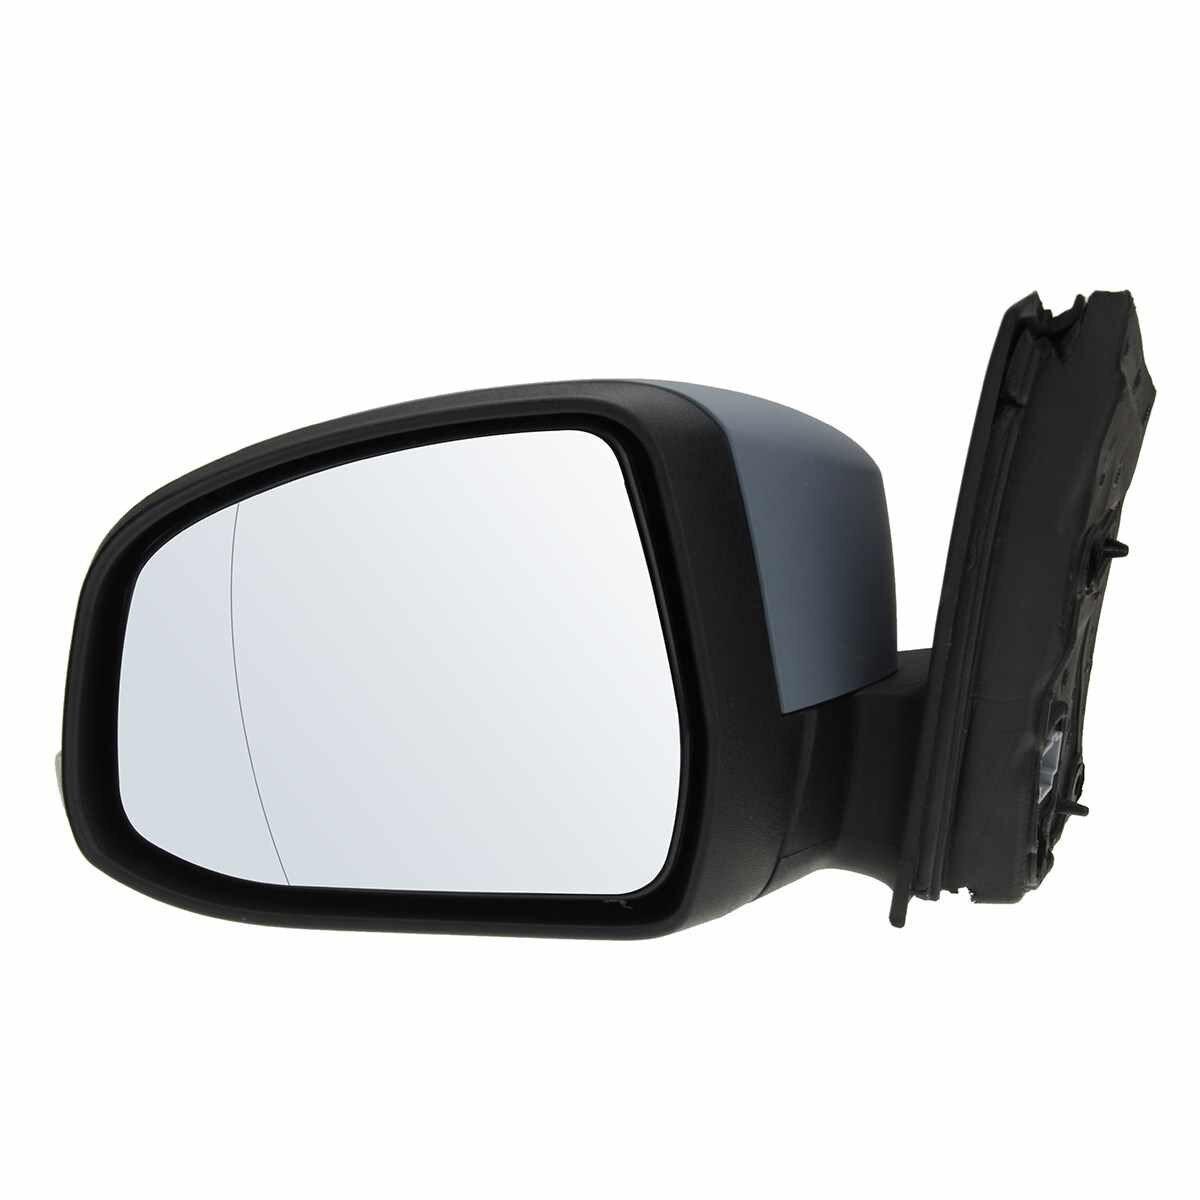 Exterior Mirror